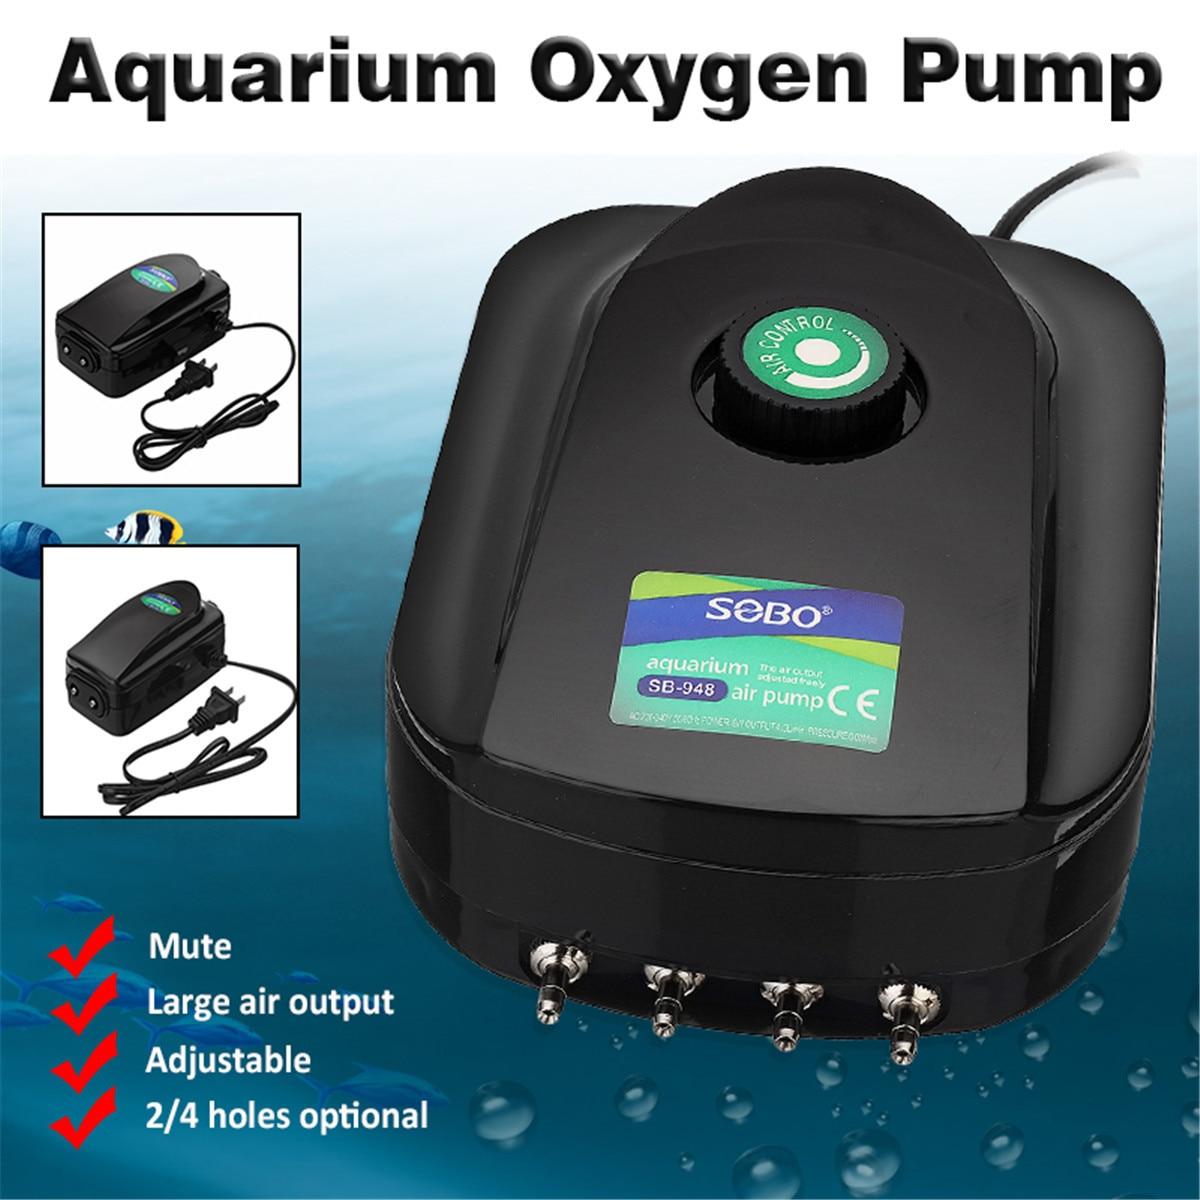 Ultra-Silent Aquarium Air Pump Adjustable Large Air Output 2/4 Holes Fish Tank Increasing Oxygen Pump Air Compressor Accessories